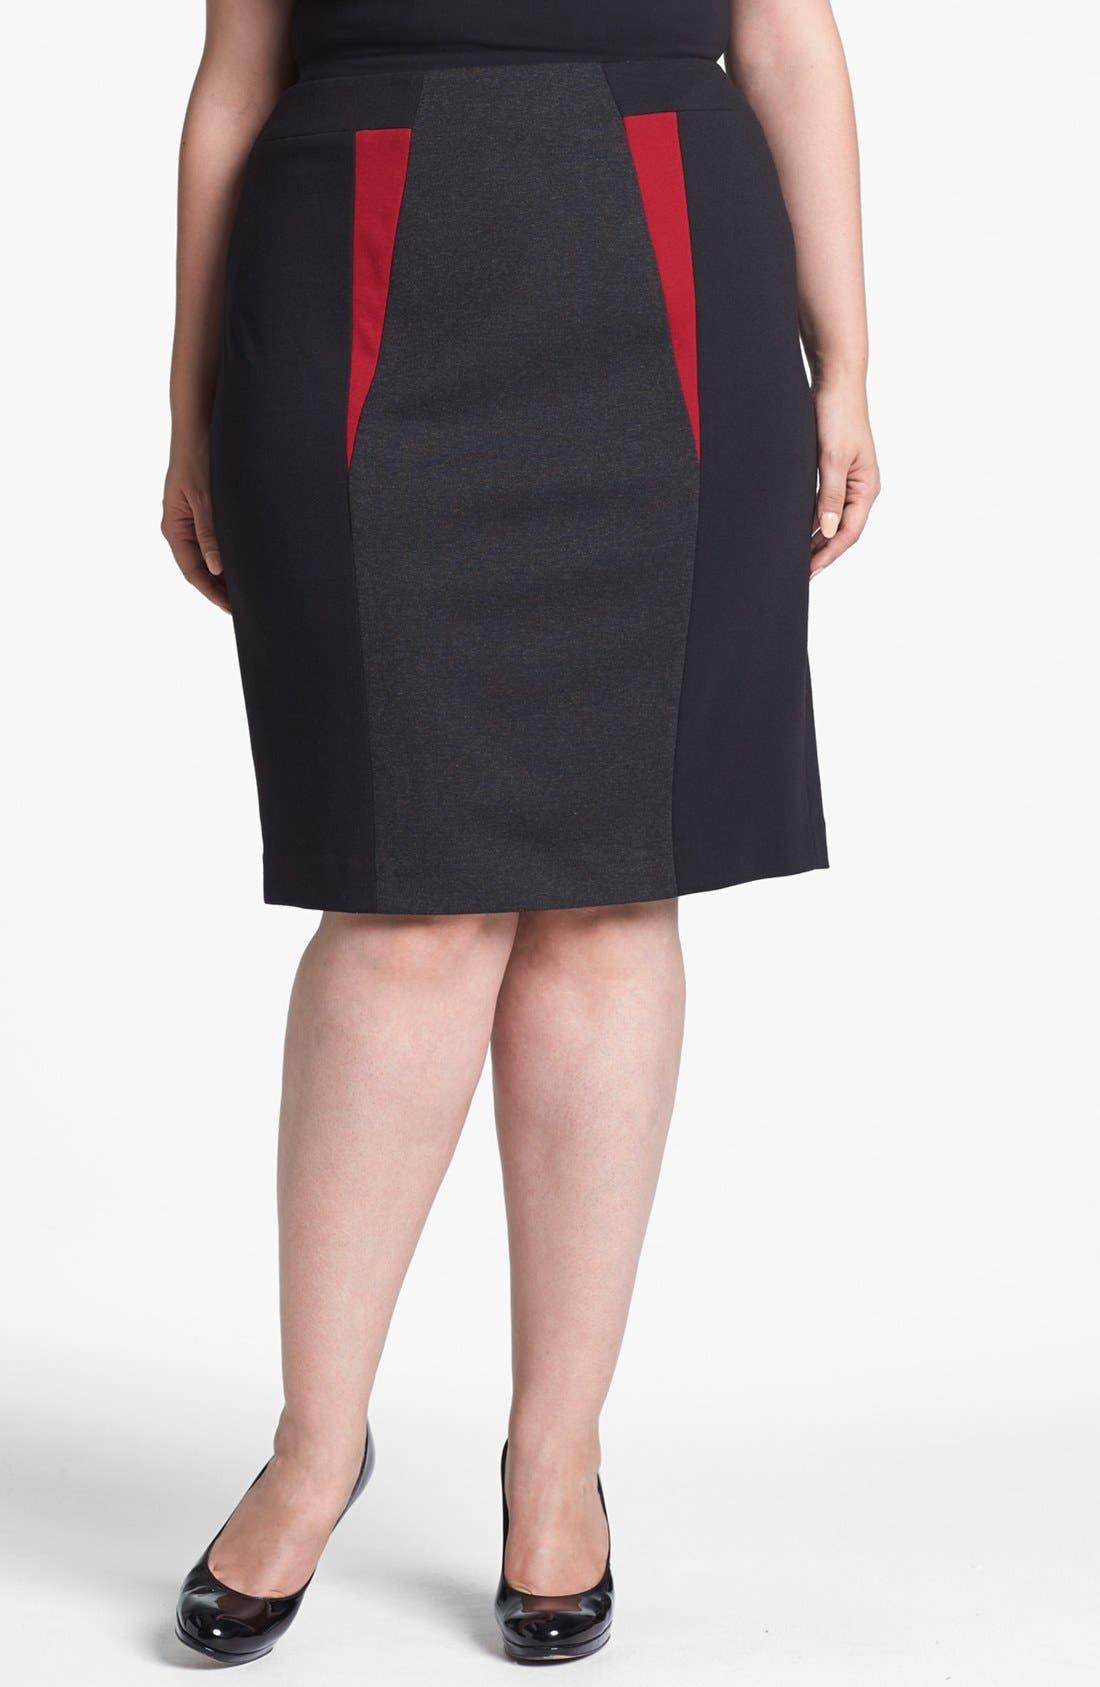 Alternate Image 1 Selected - Sejour Colorblock Ponte Knit Pencil Skirt (Plus Size)